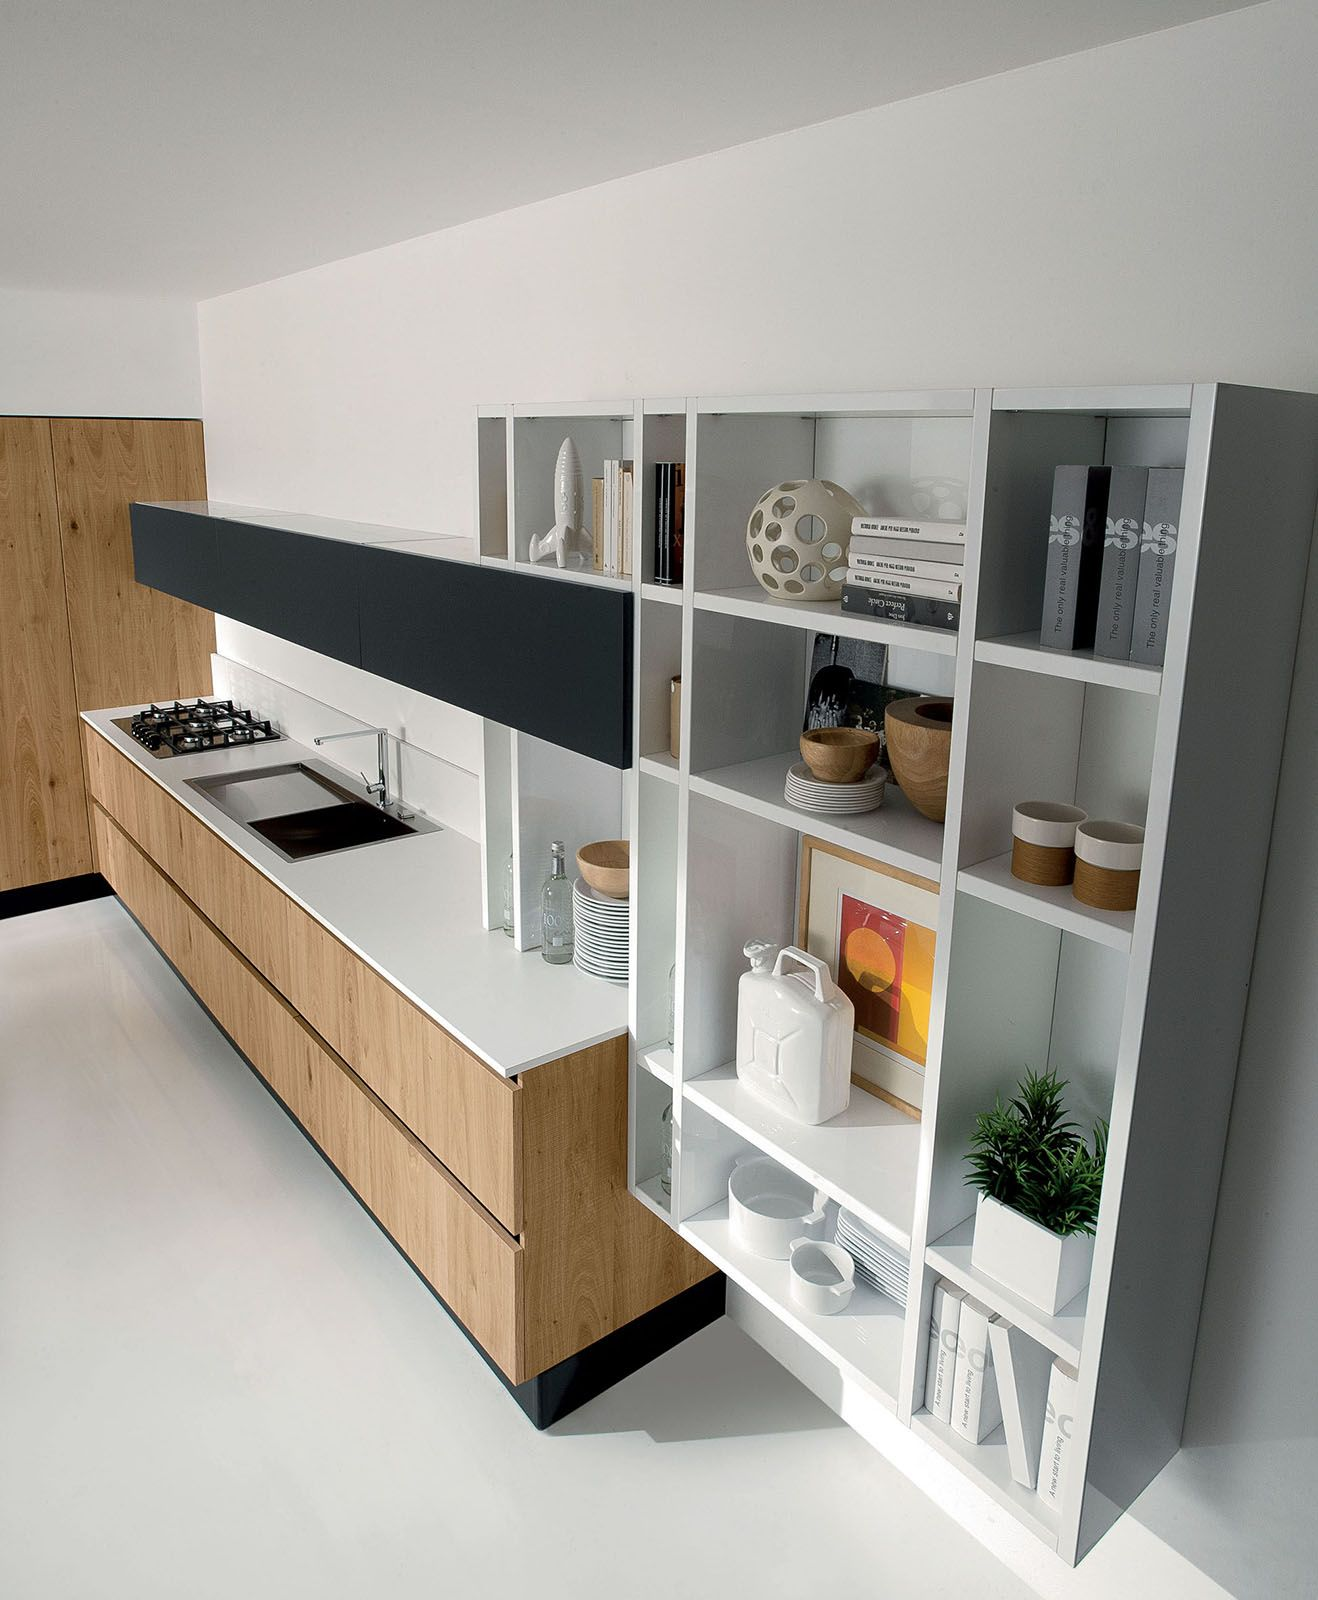 Aran-Cucine-Volare-cucina-scaffali   интерьер идеи   Pinterest ...